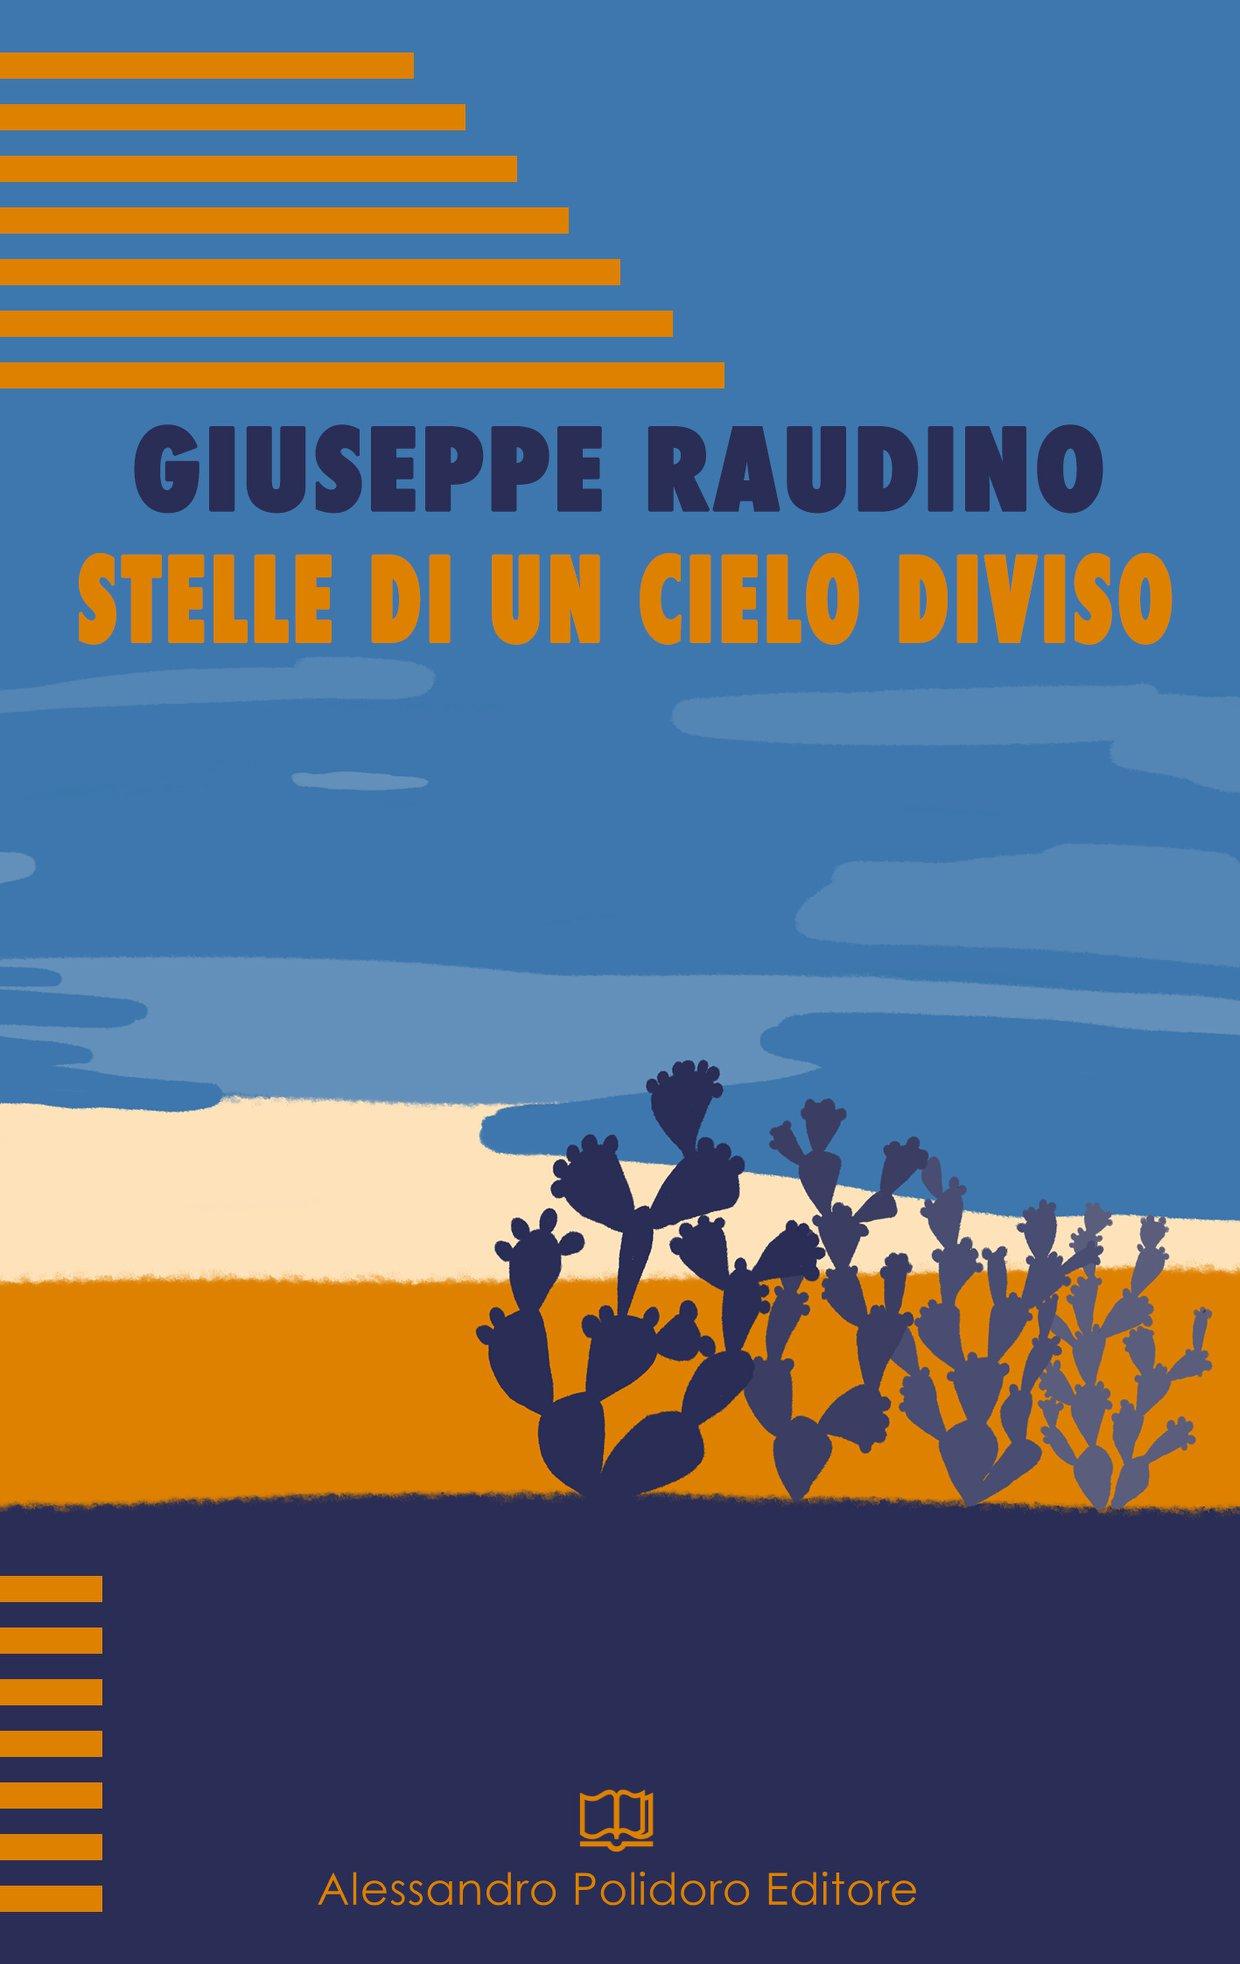 Stelle di un cielo diviso – Giuseppe Raudino. Un estratto